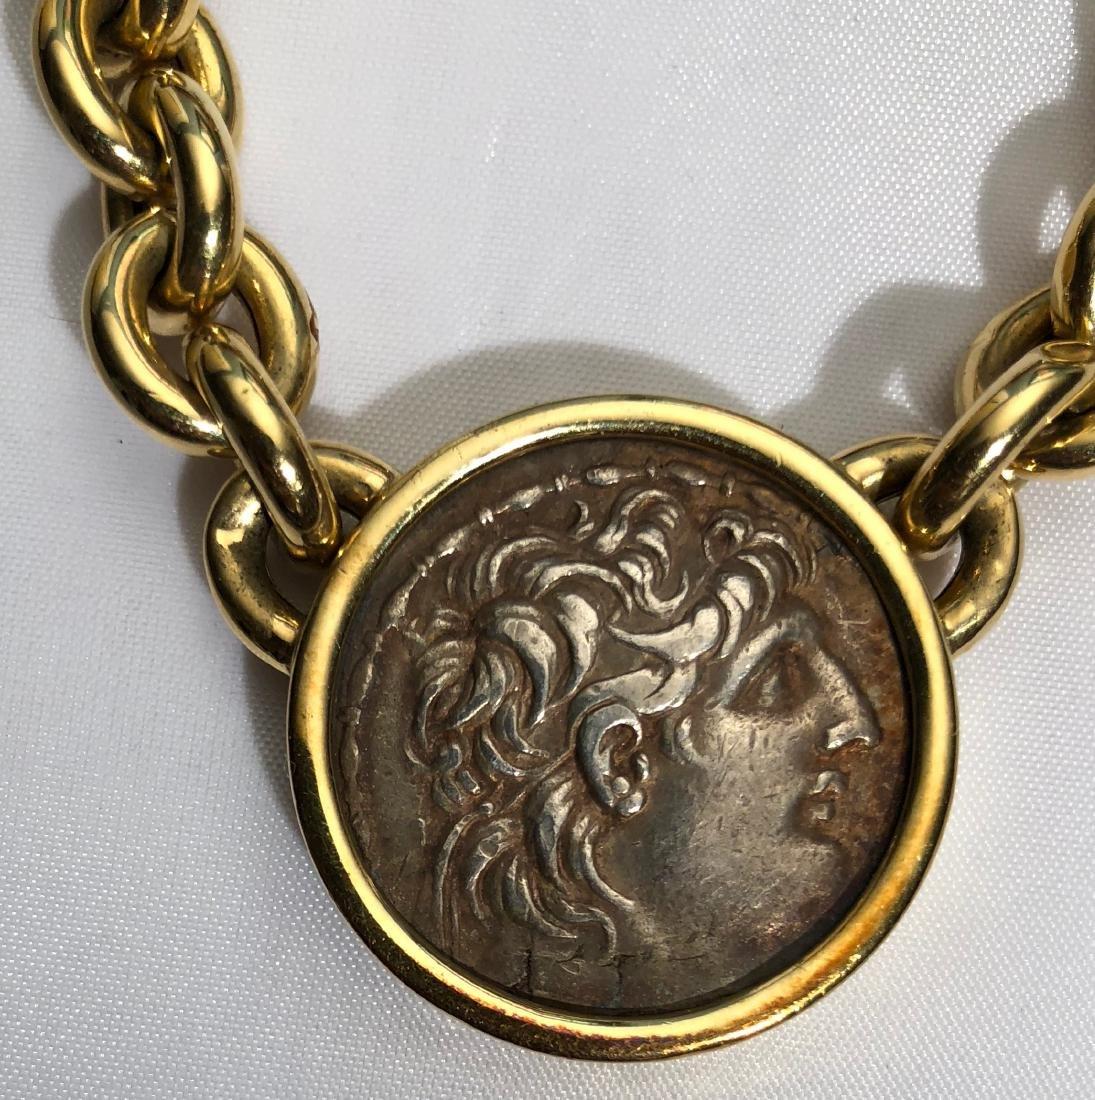 Bucciari 18k Ancient Coin Chain Link Necklace - 2